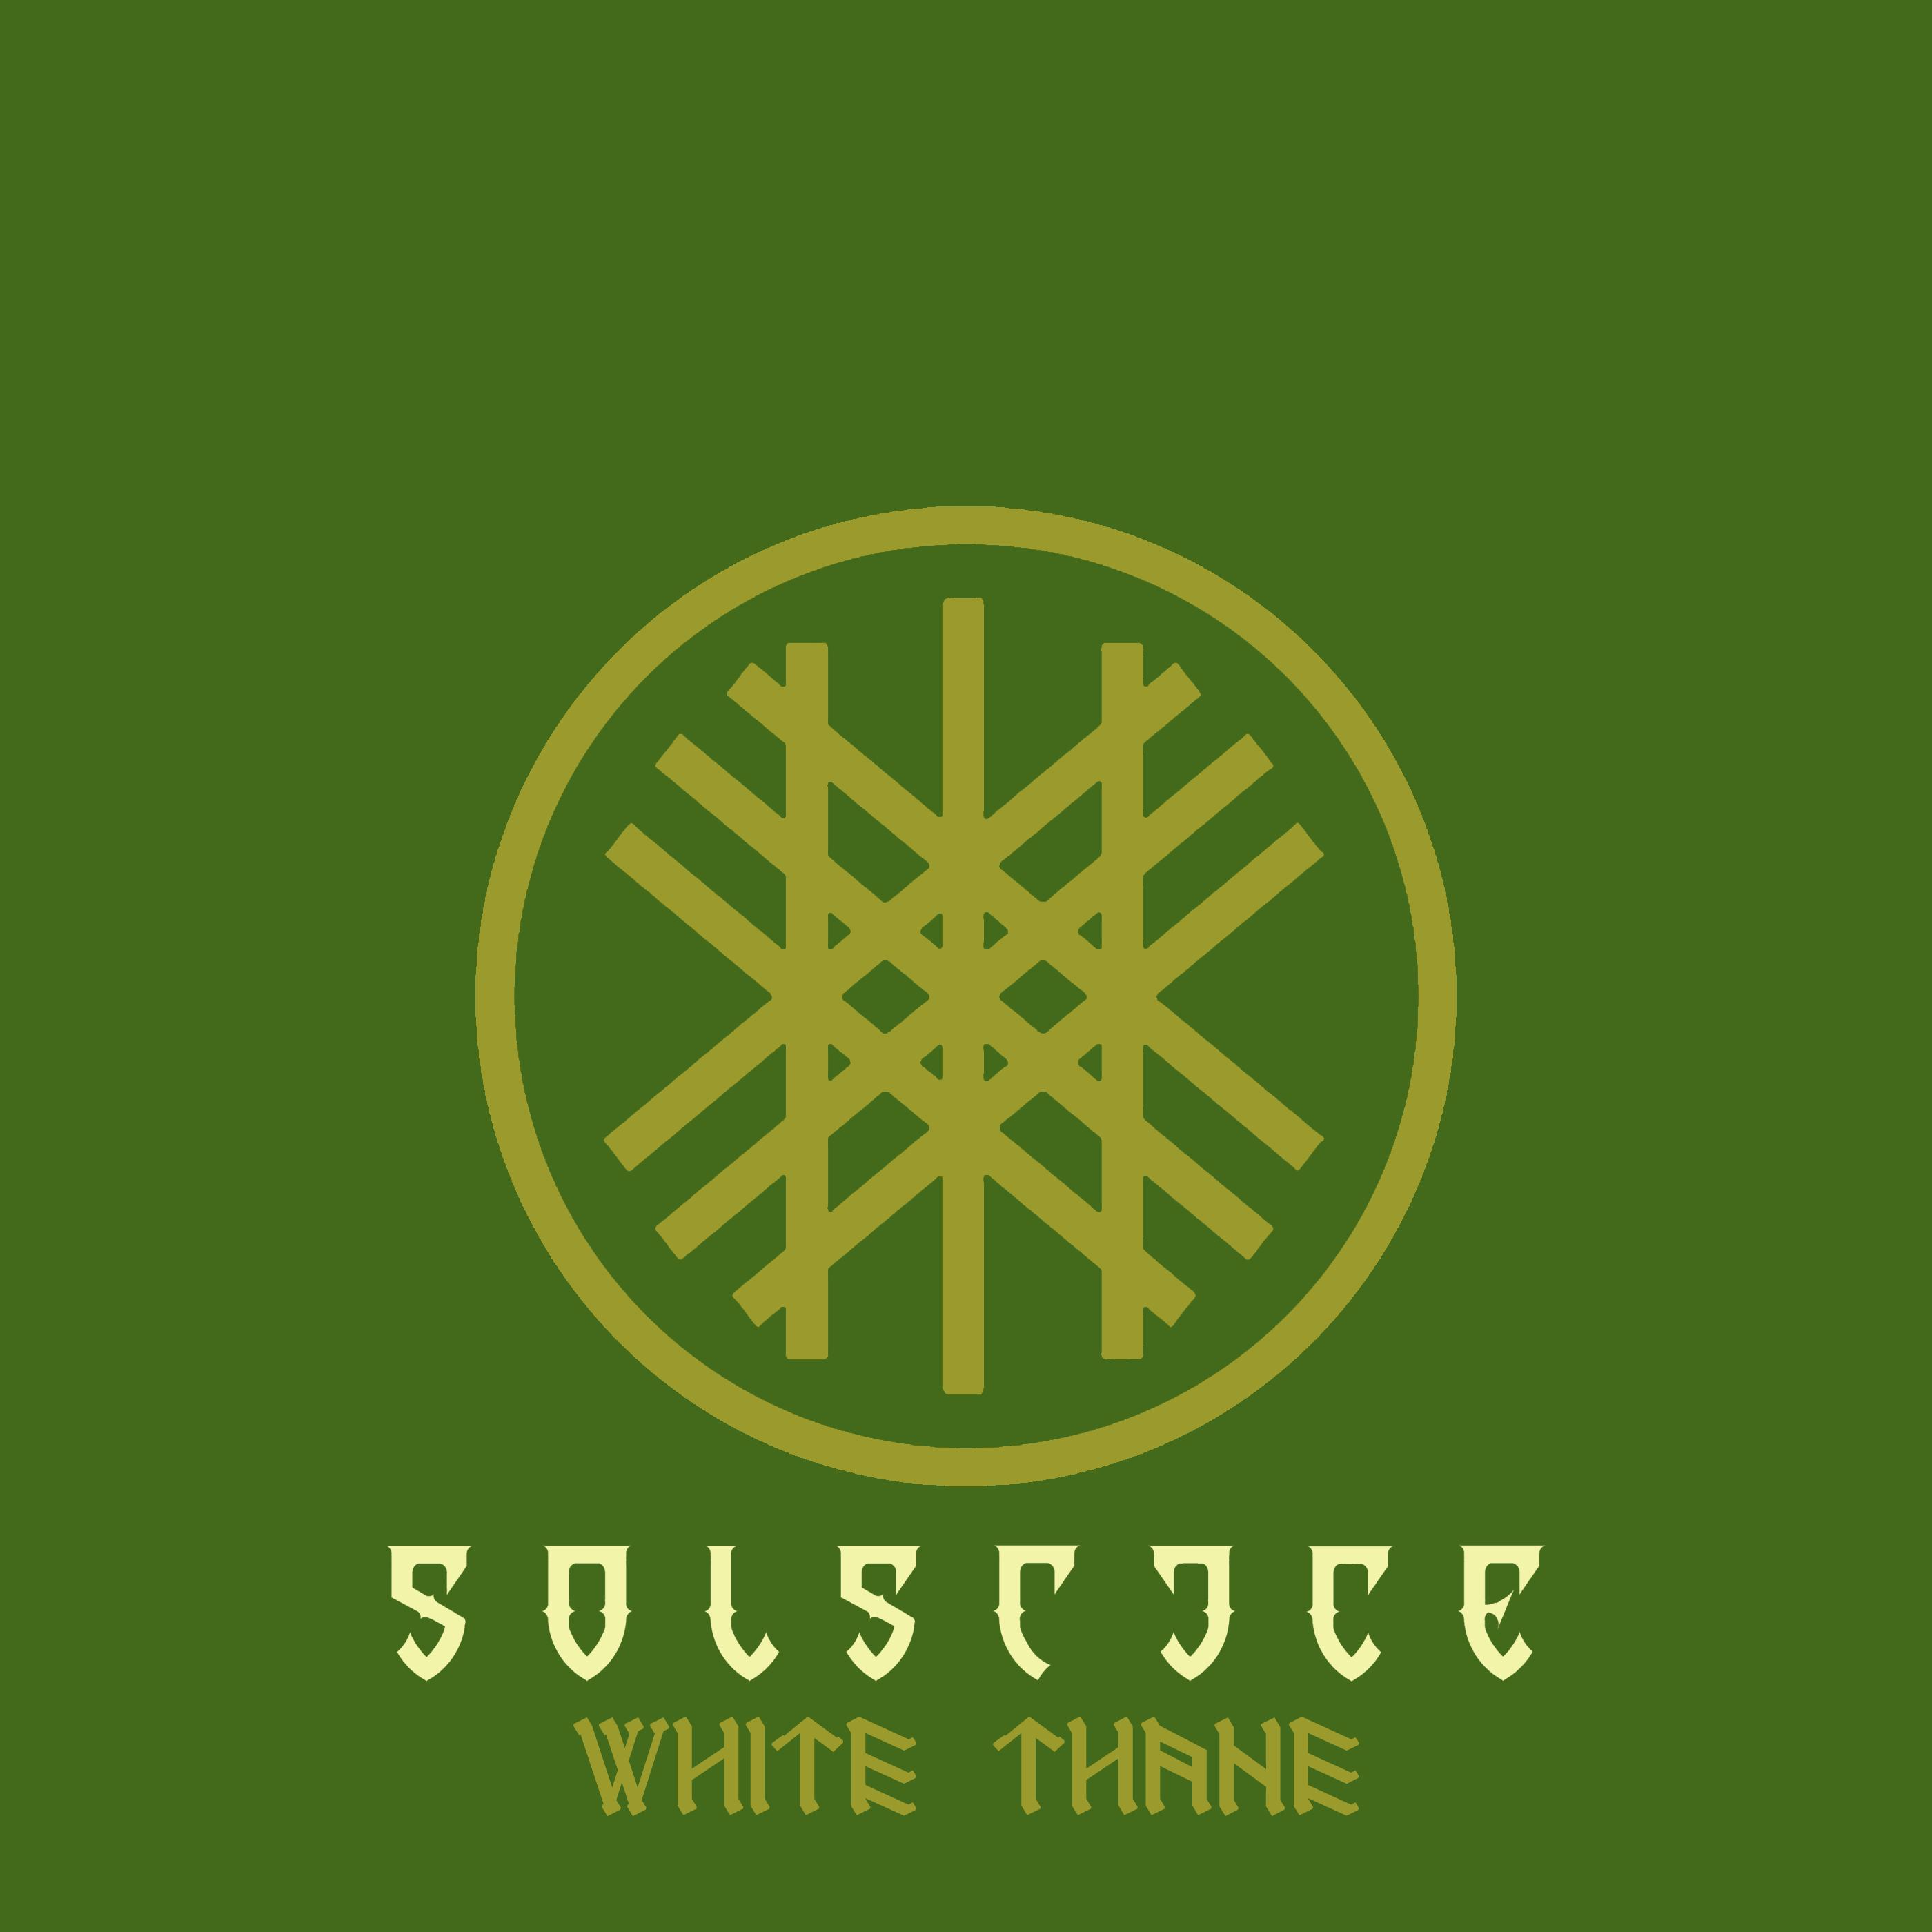 Solstice - White Thane  - 2019